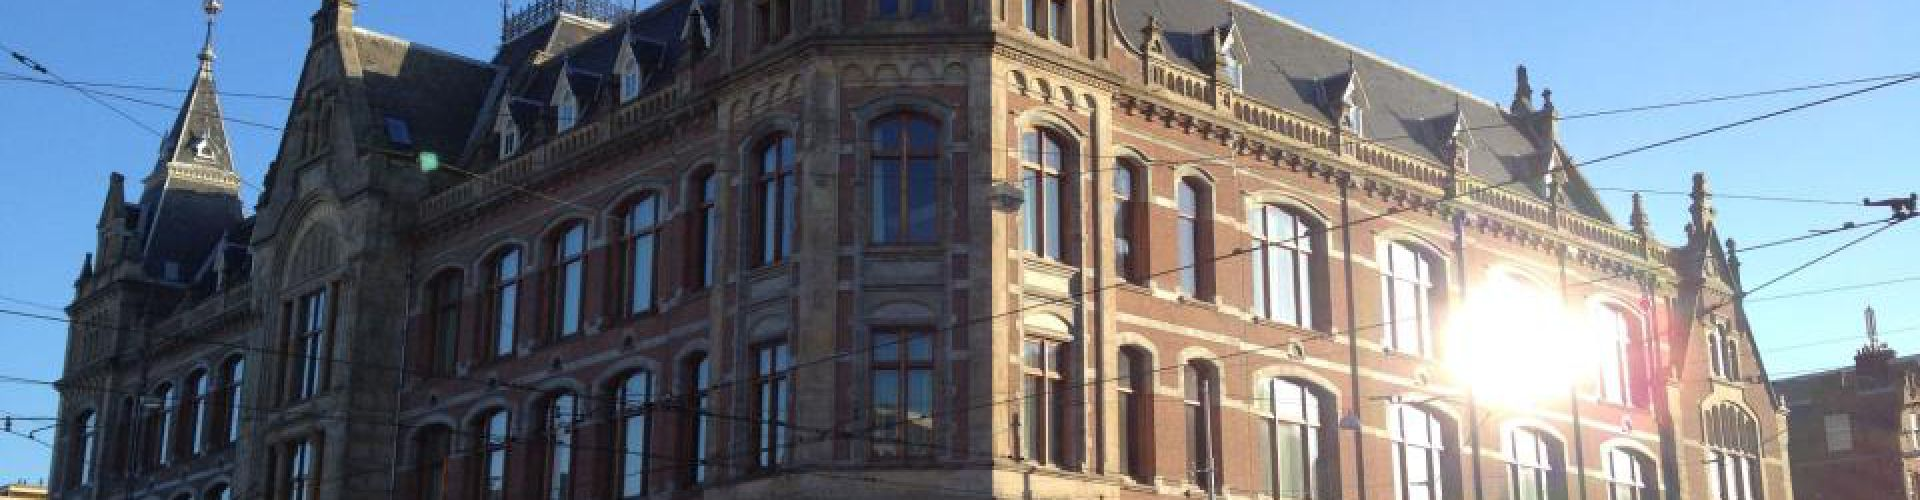 Conservatorium hotel luxury hotel amsterdam reviews for Best luxury hotel in amsterdam